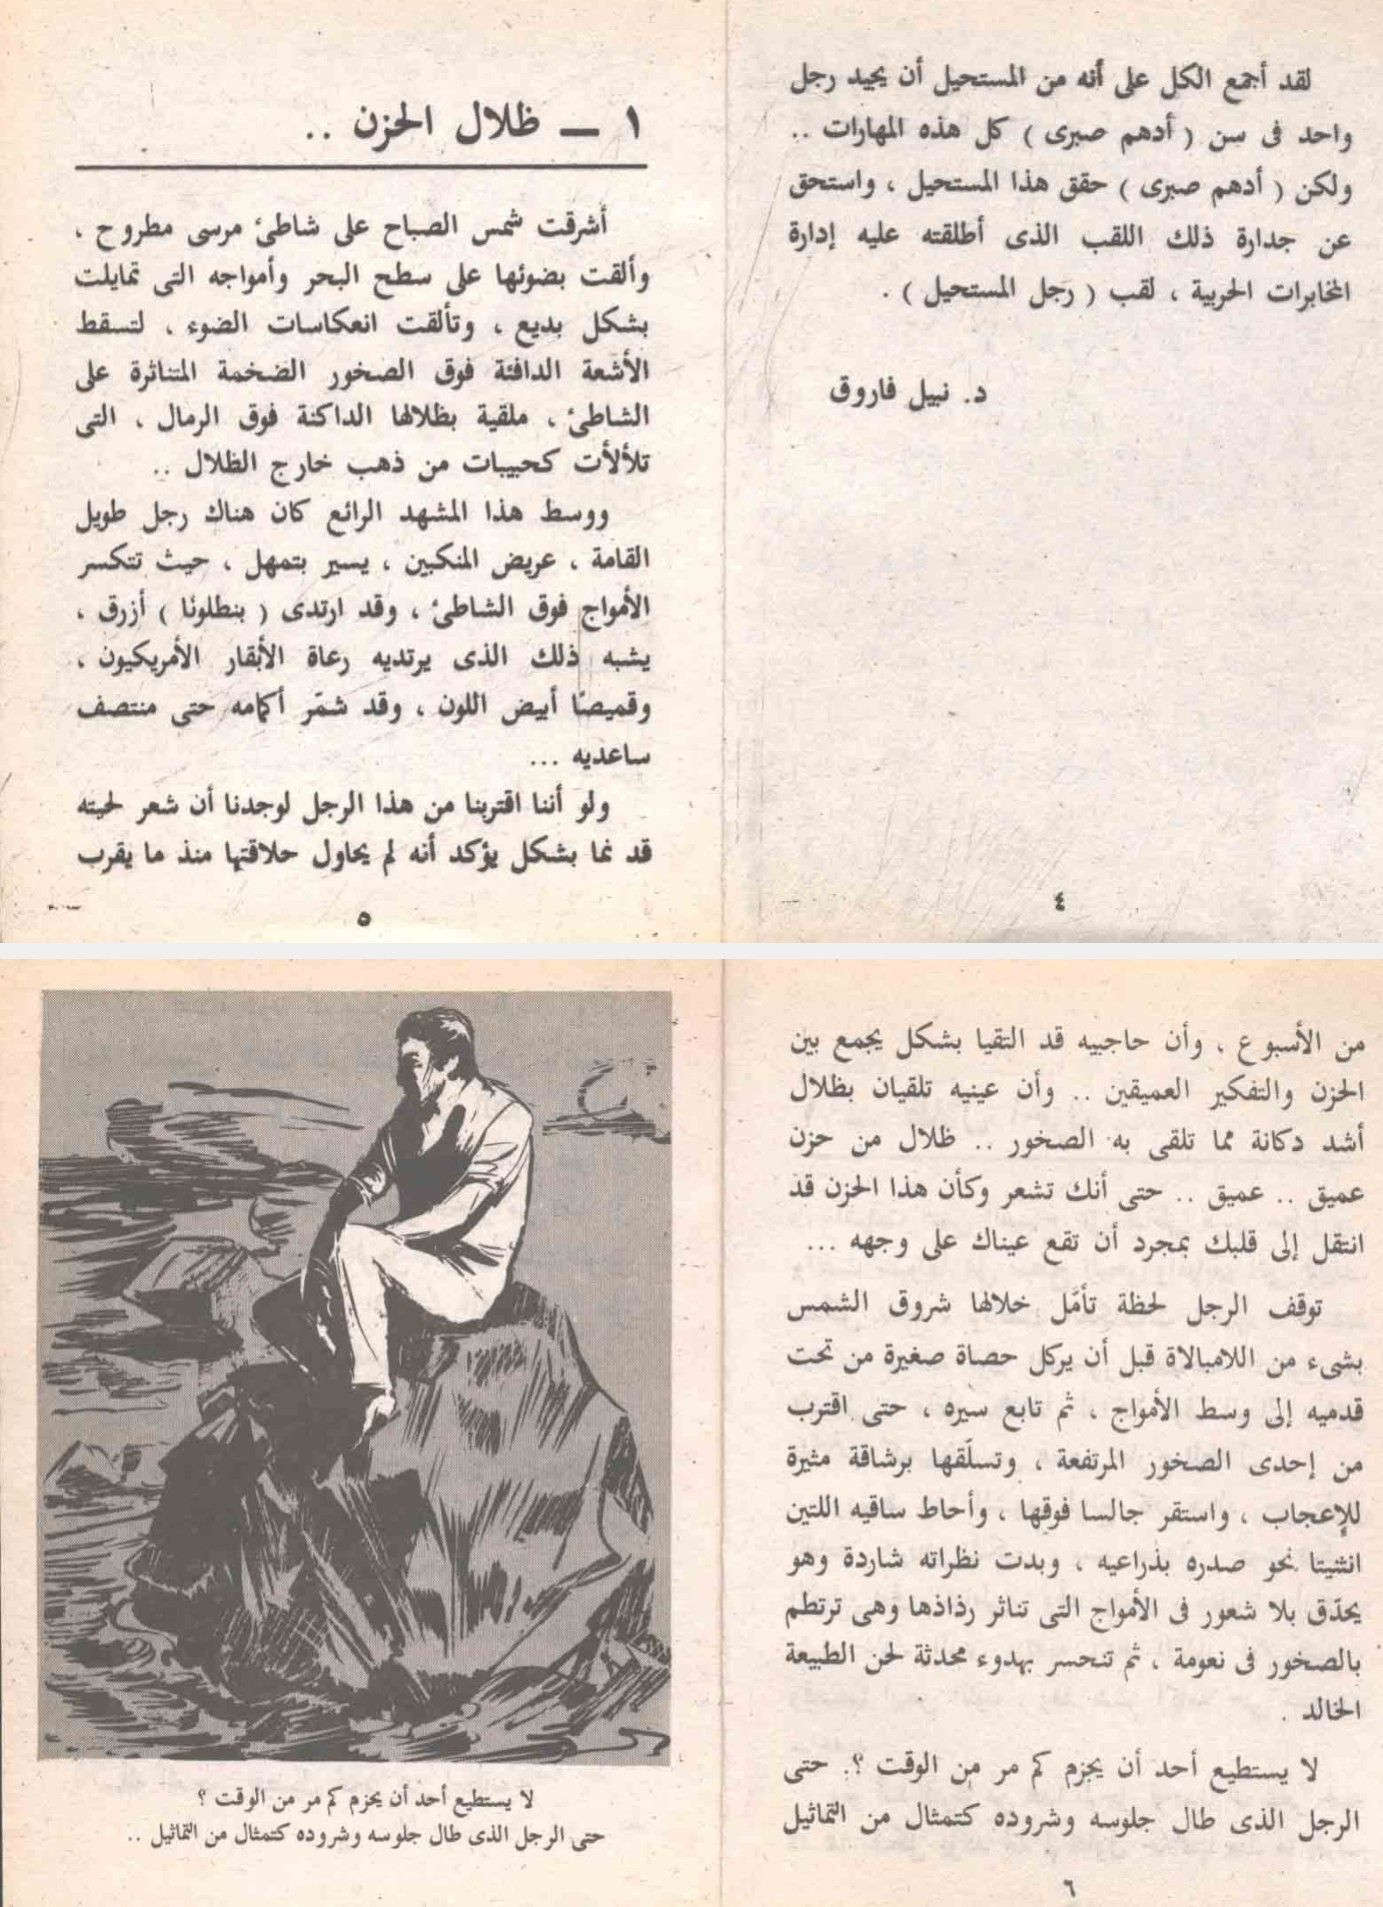 Pin By Nany On روايات مصرية Books Cover Art